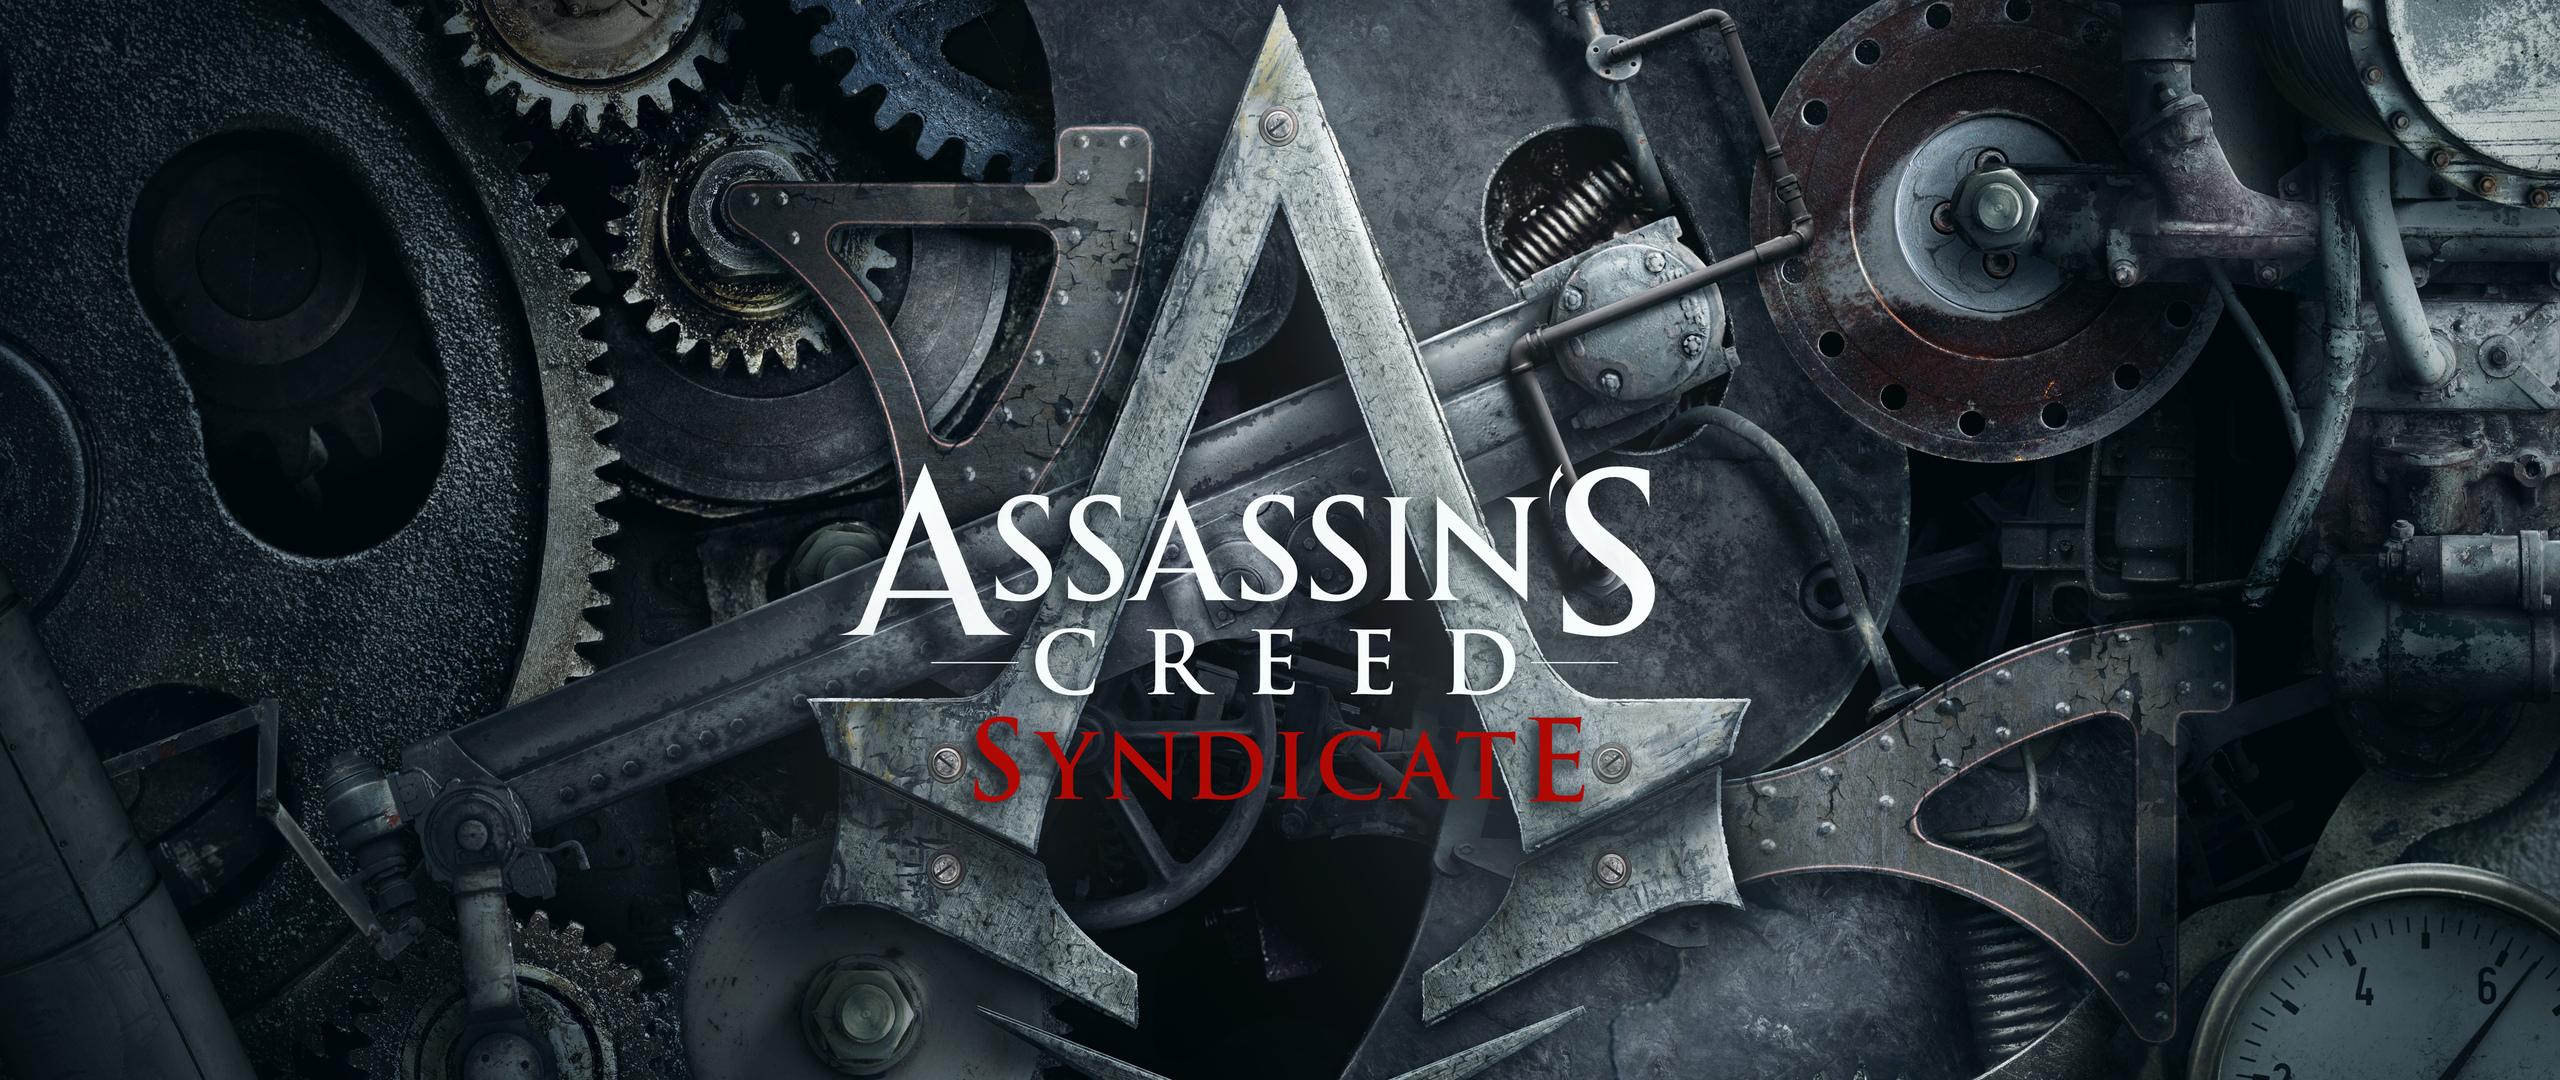 2560x1080 Assassins Creed Syndicate Logo 2560x1080 Resolution Hd